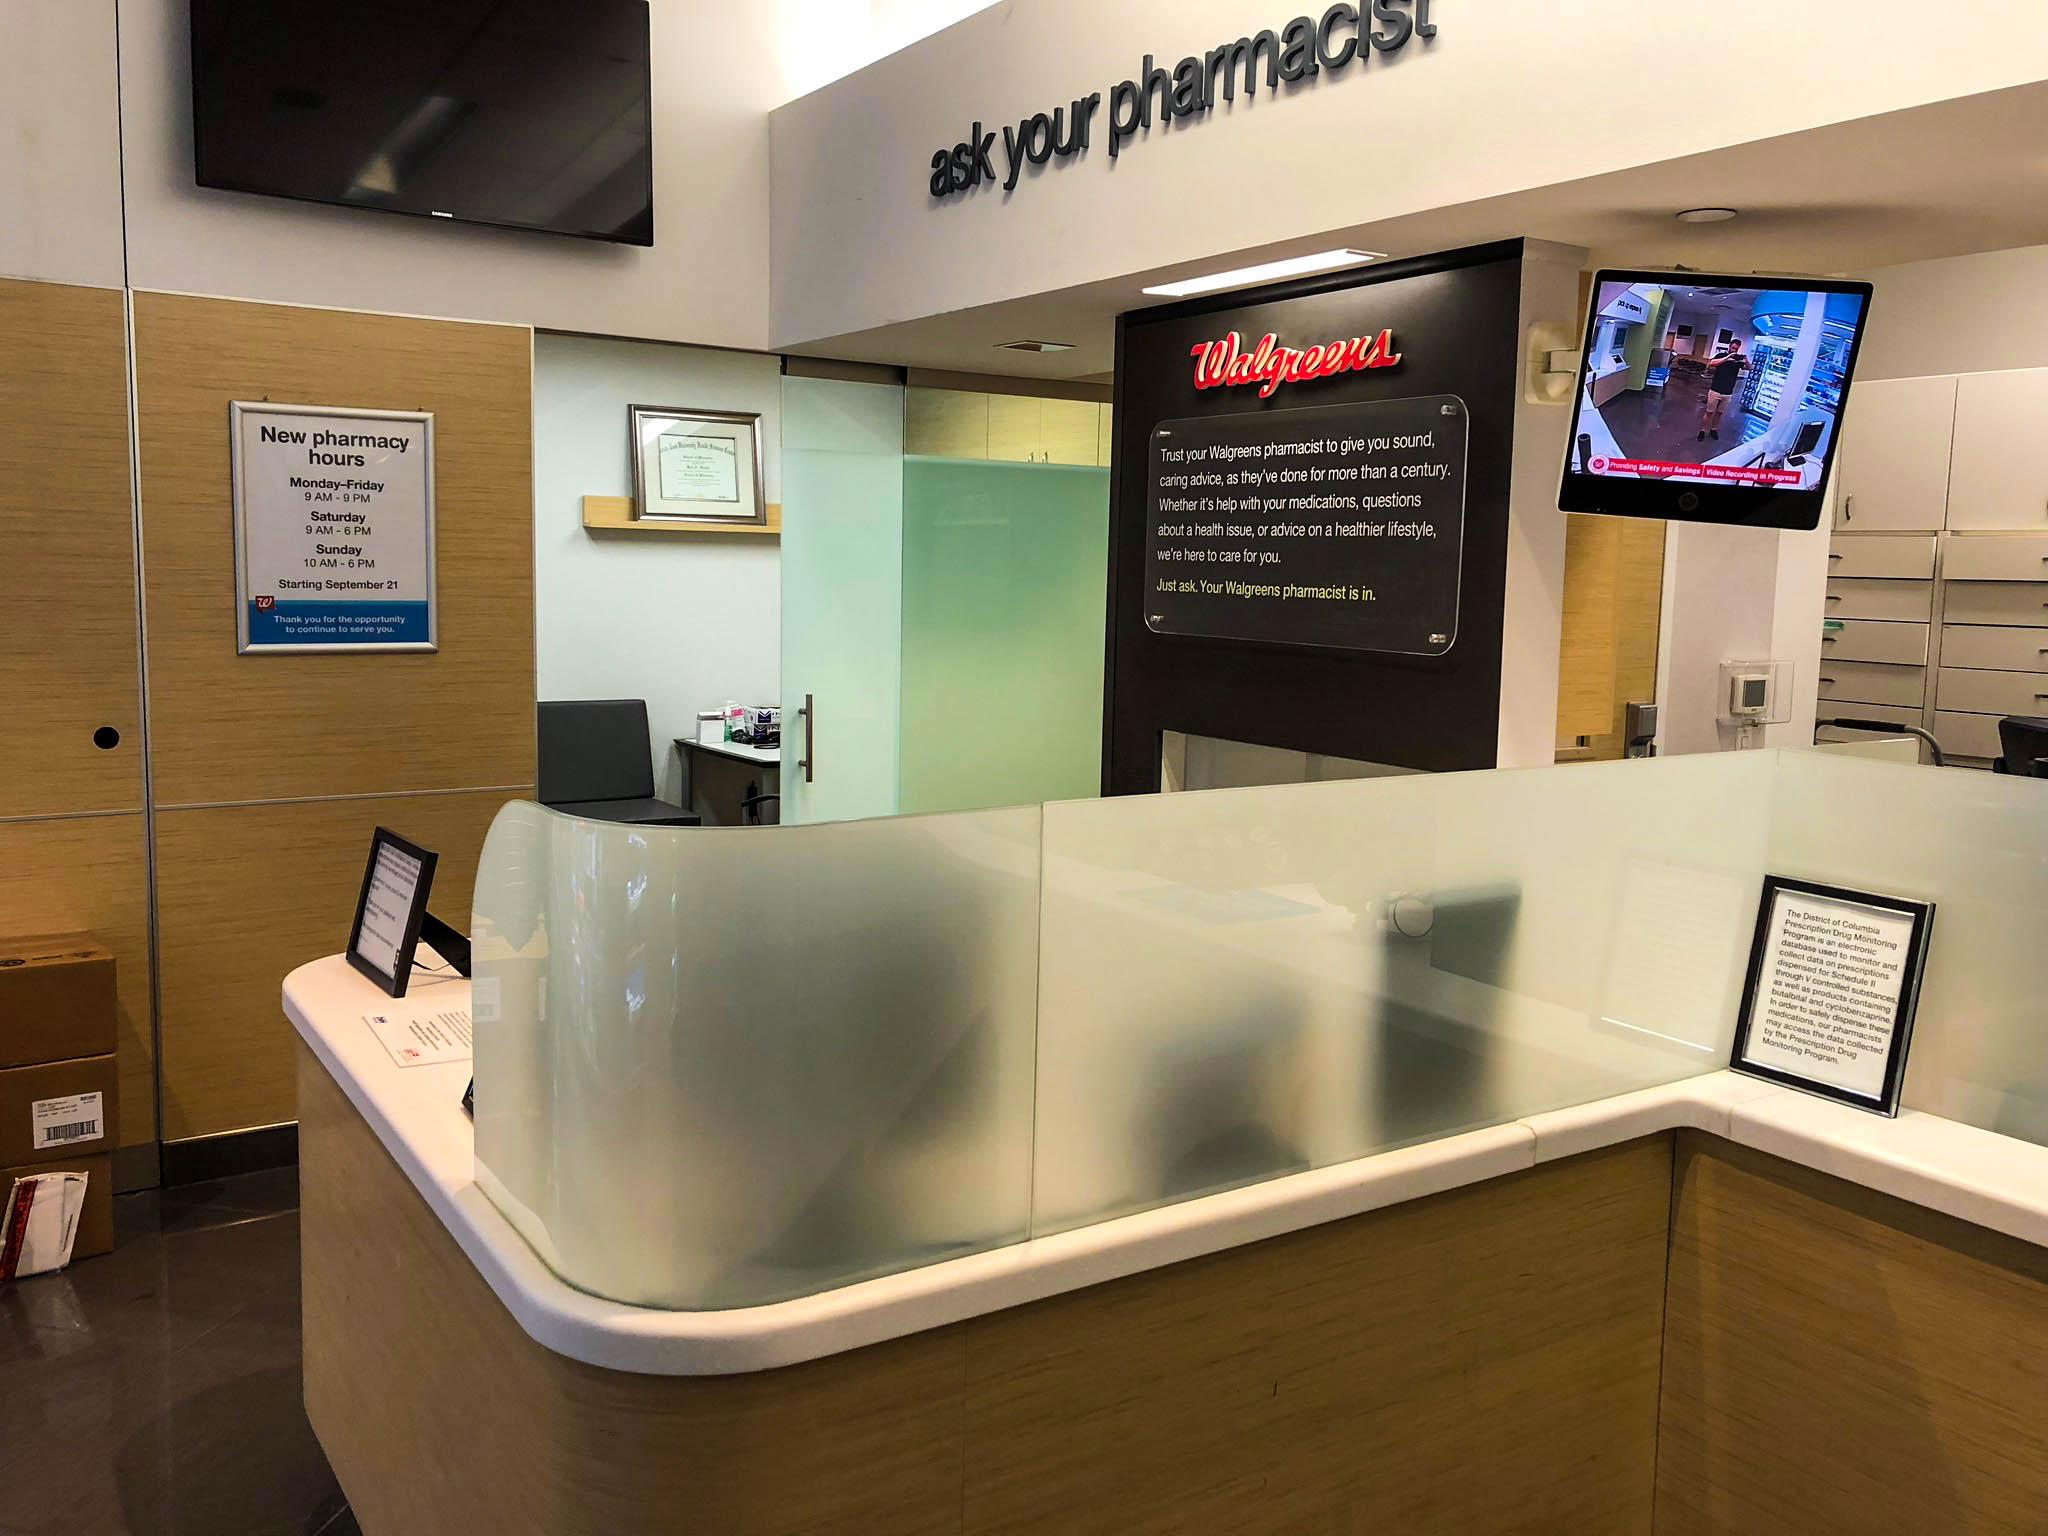 Walgreens - Pharmacy counter